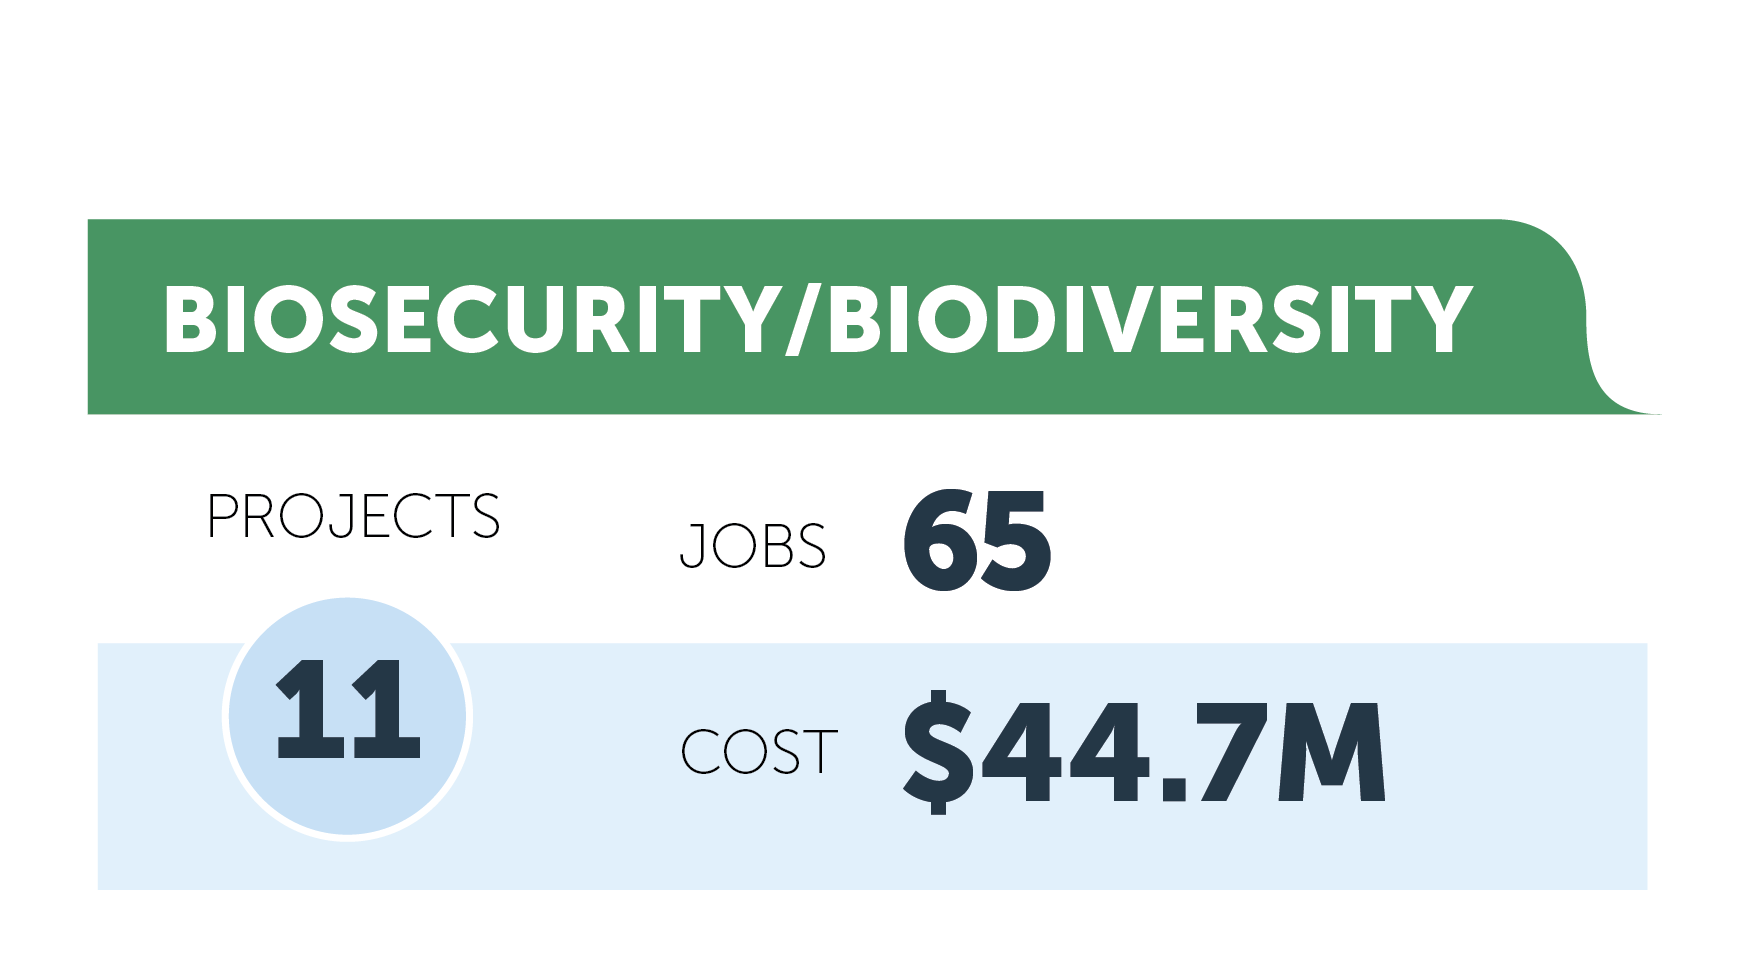 Biosecurity/Biodiversity figures